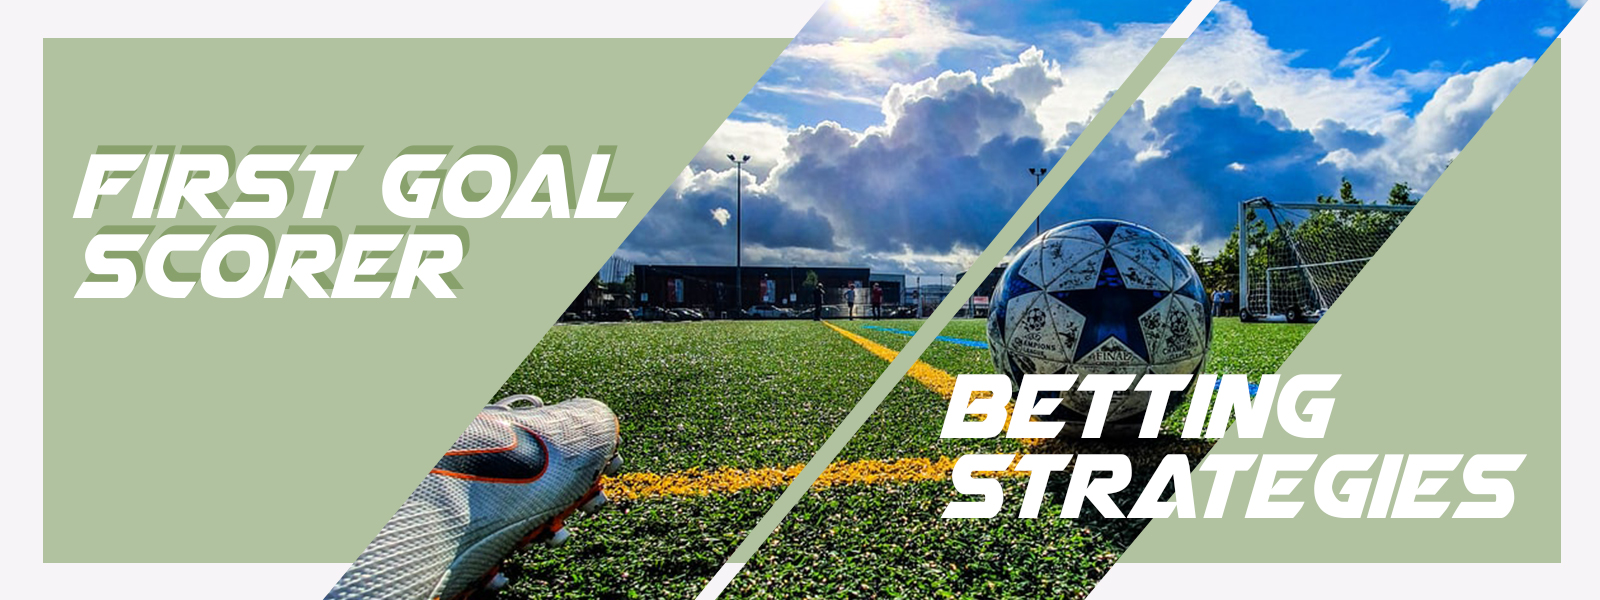 First Goal Scorer Soccer Betting Strategies